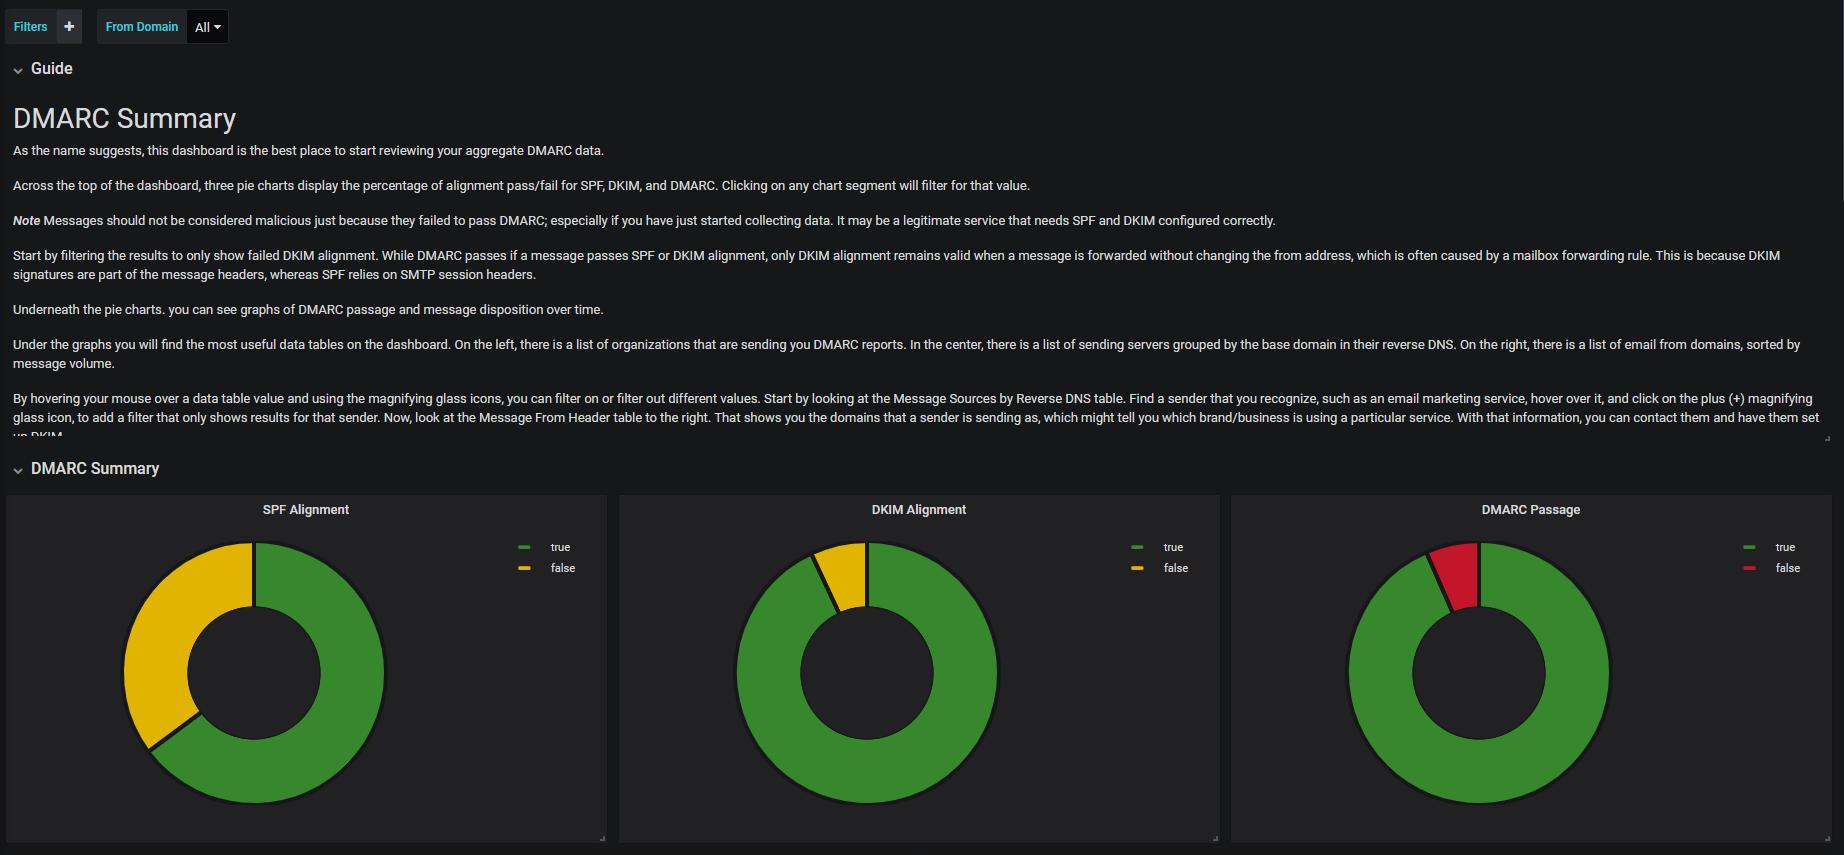 DMARC Report Overview